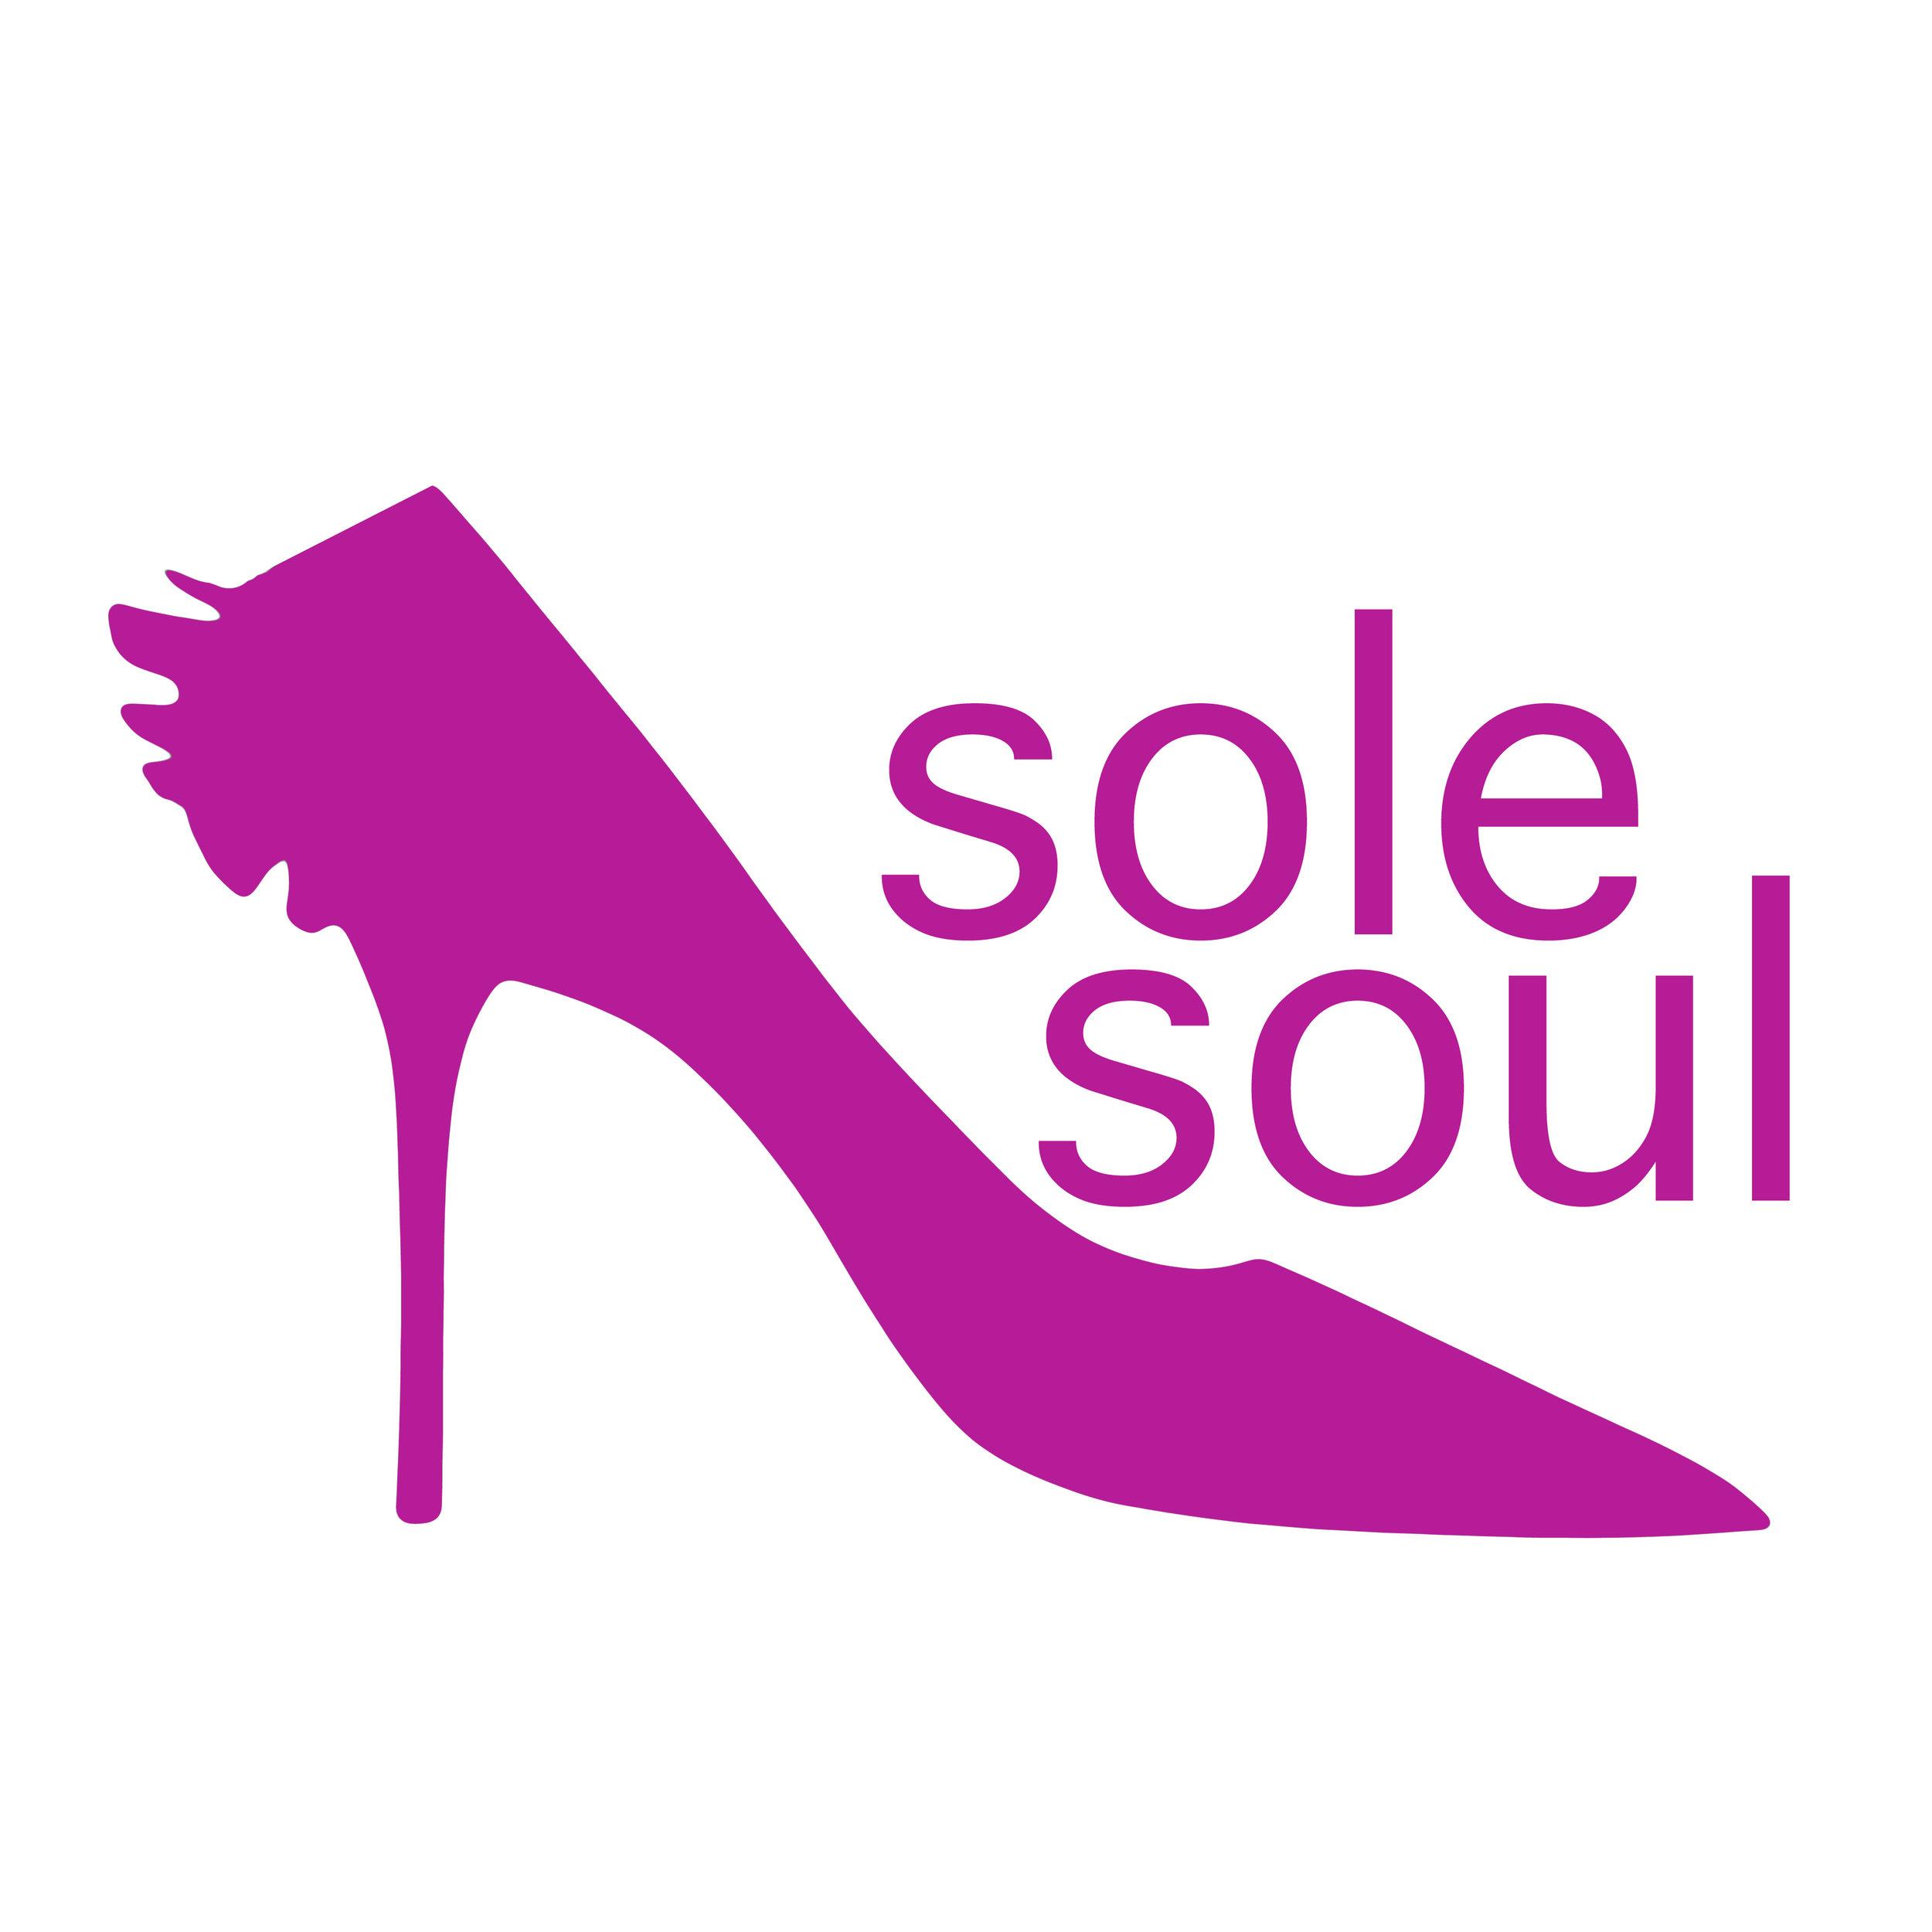 SOLESOUL.jpg